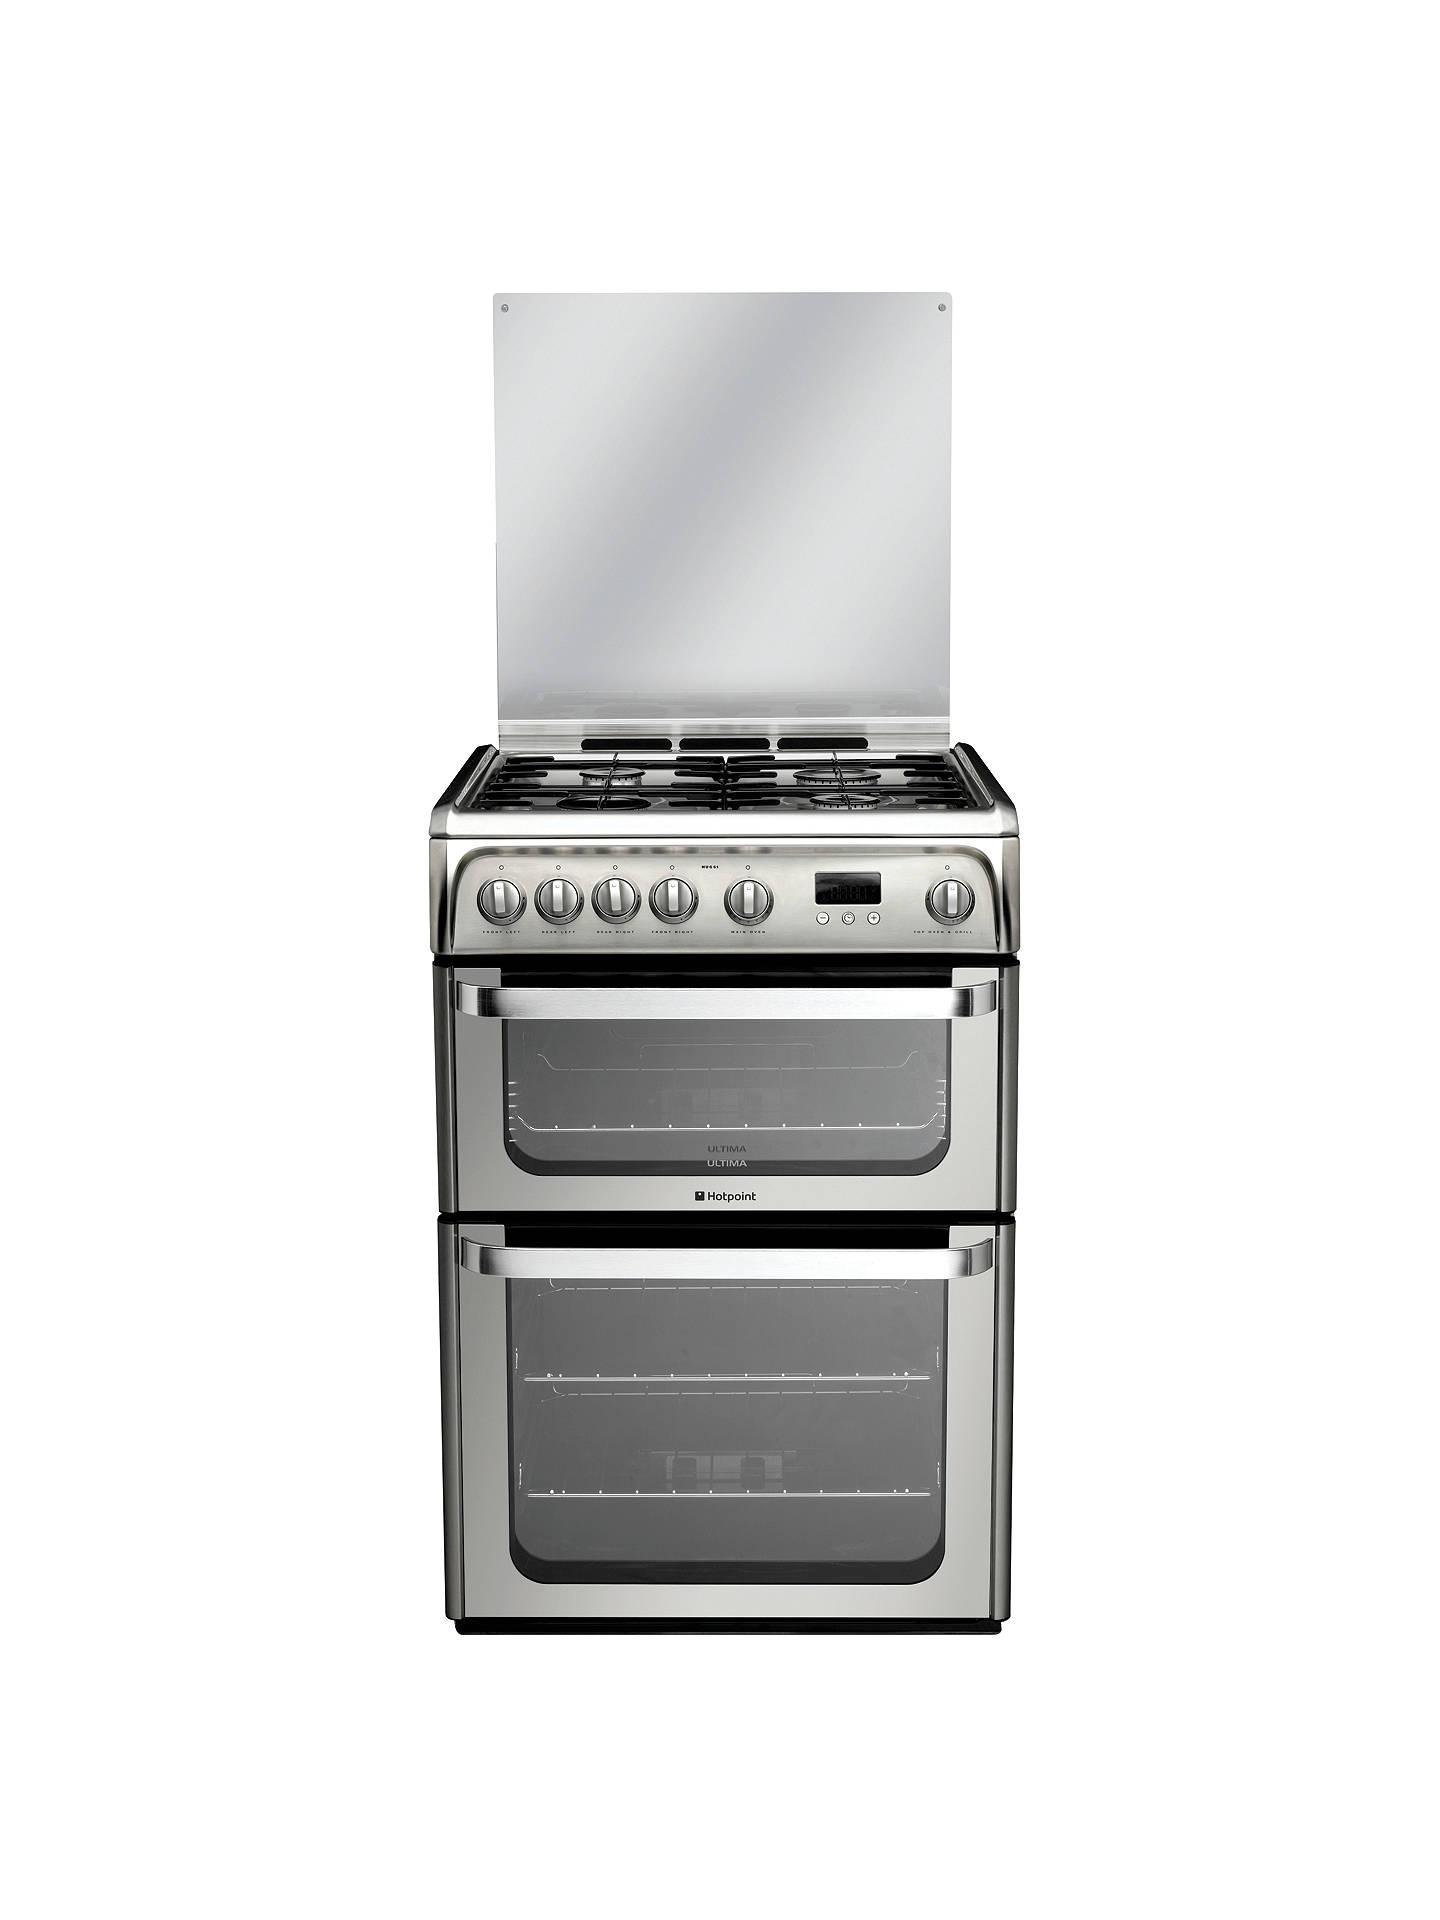 hotpoint hug61x ultima gas cooker stainless steel at john. Black Bedroom Furniture Sets. Home Design Ideas